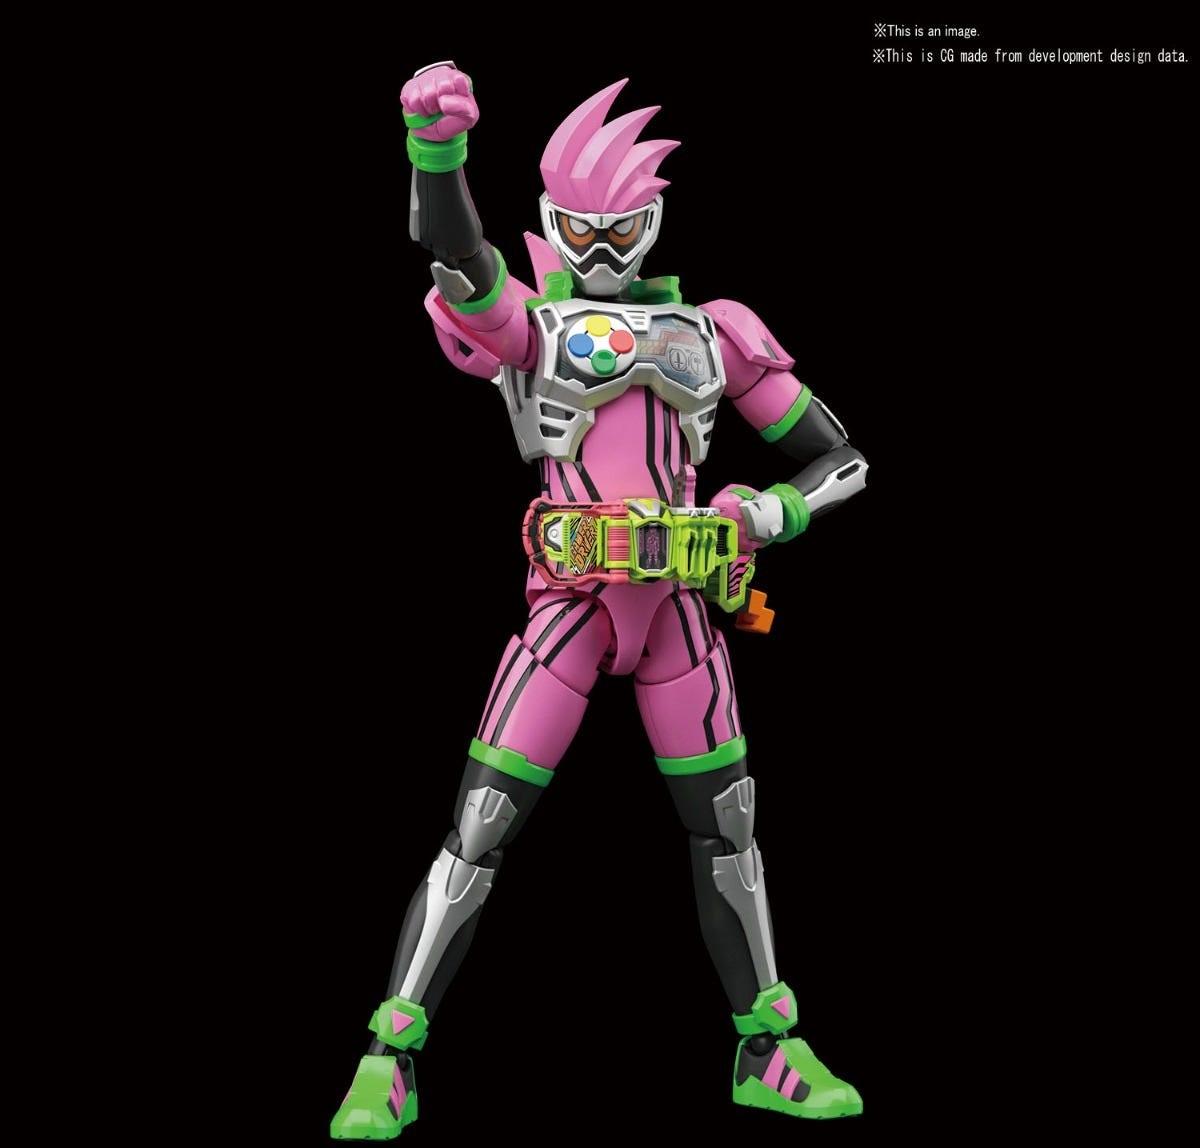 Bandai Spirits Figure-Rise Standard Kamen Rider Ex-Aid Action Gamer Level 2